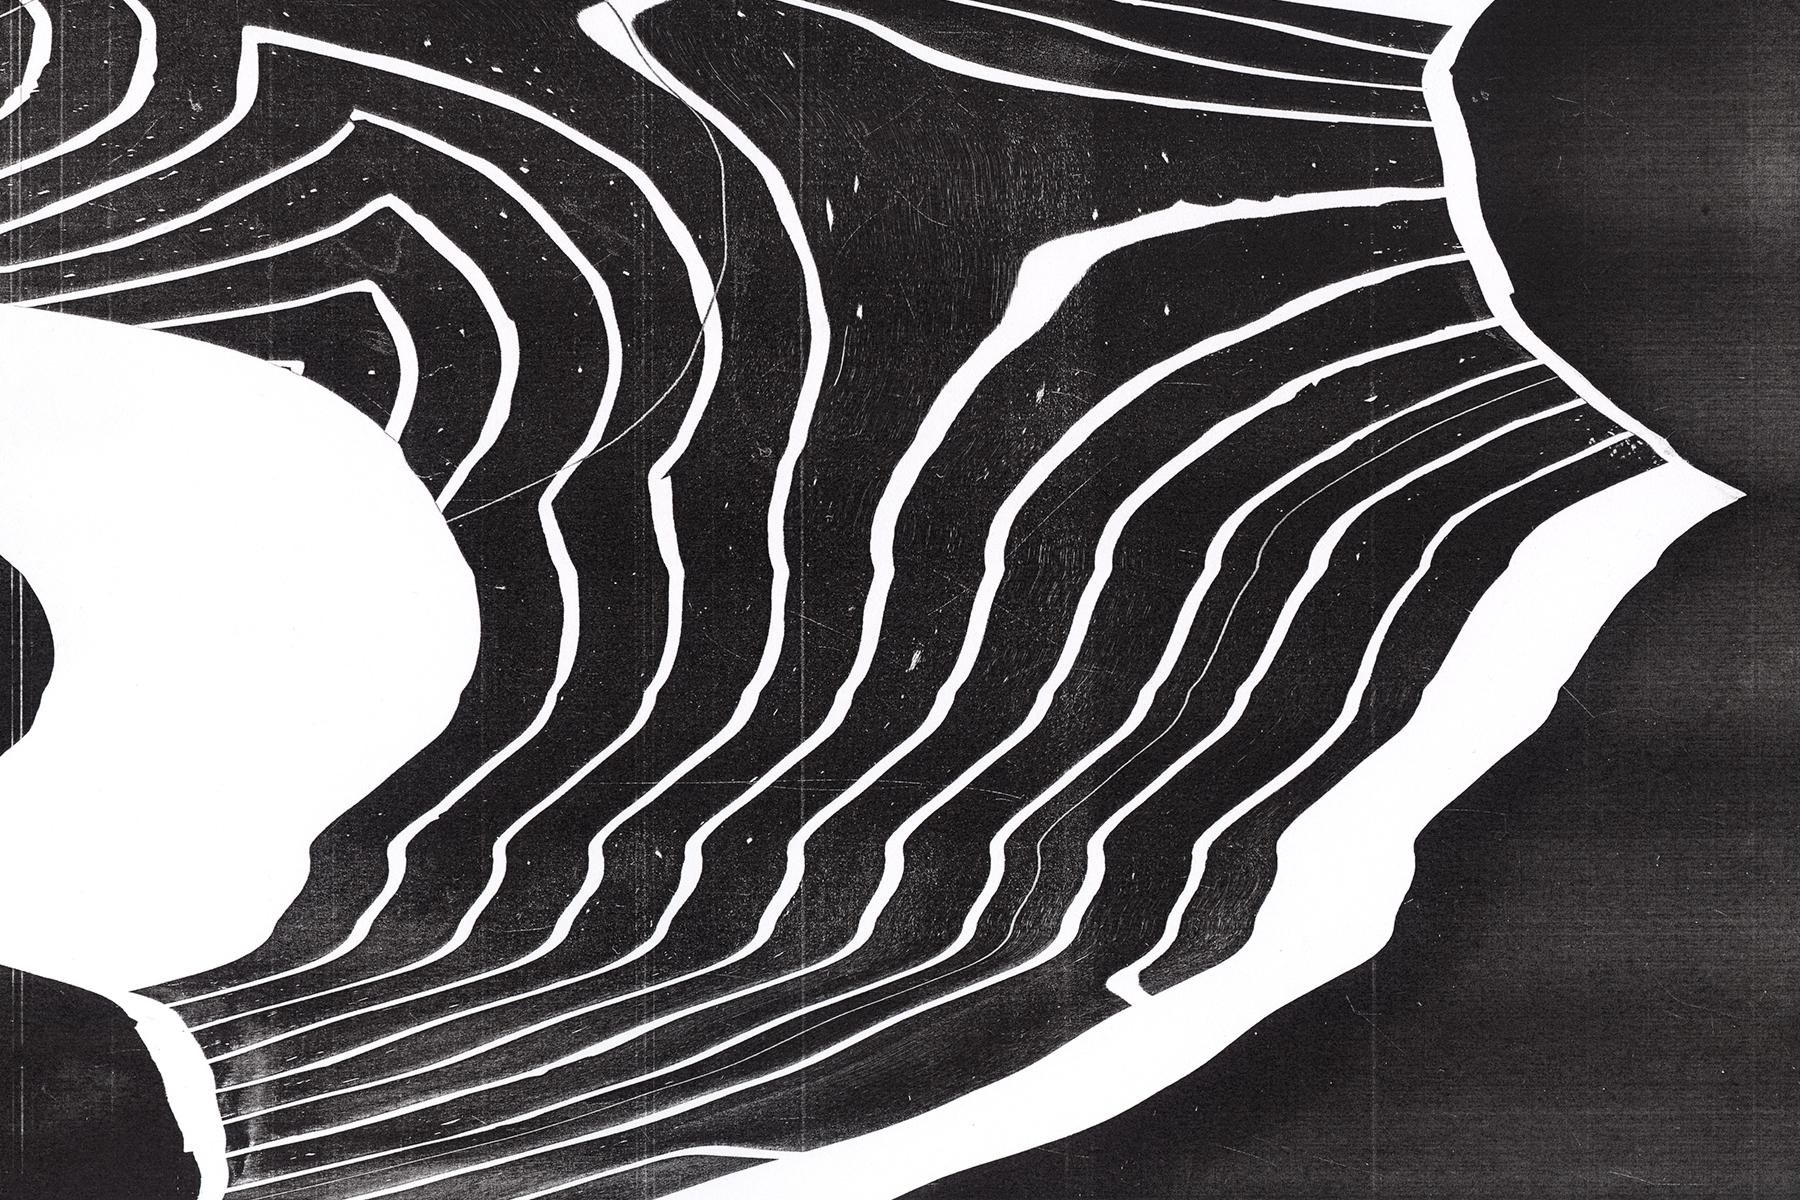 16 Photocopied Stripes example image 3